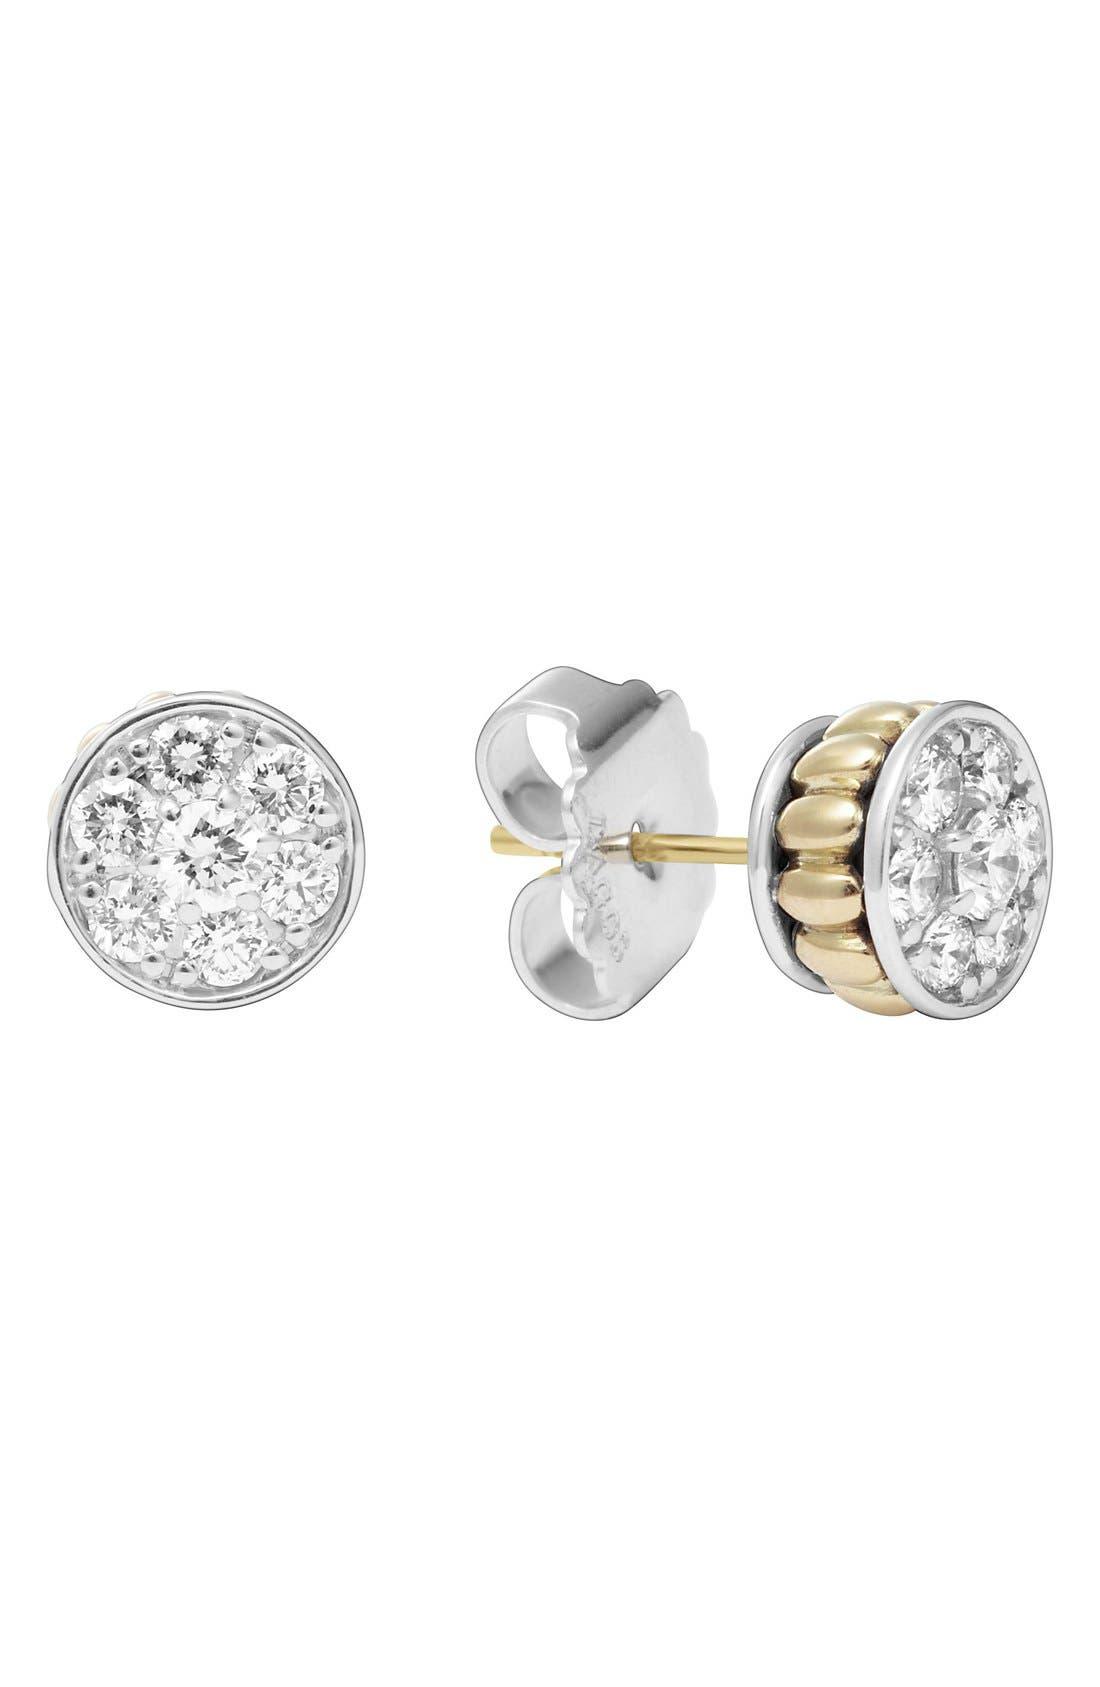 Diamond & Caviar Stud Earrings,                         Main,                         color, 040